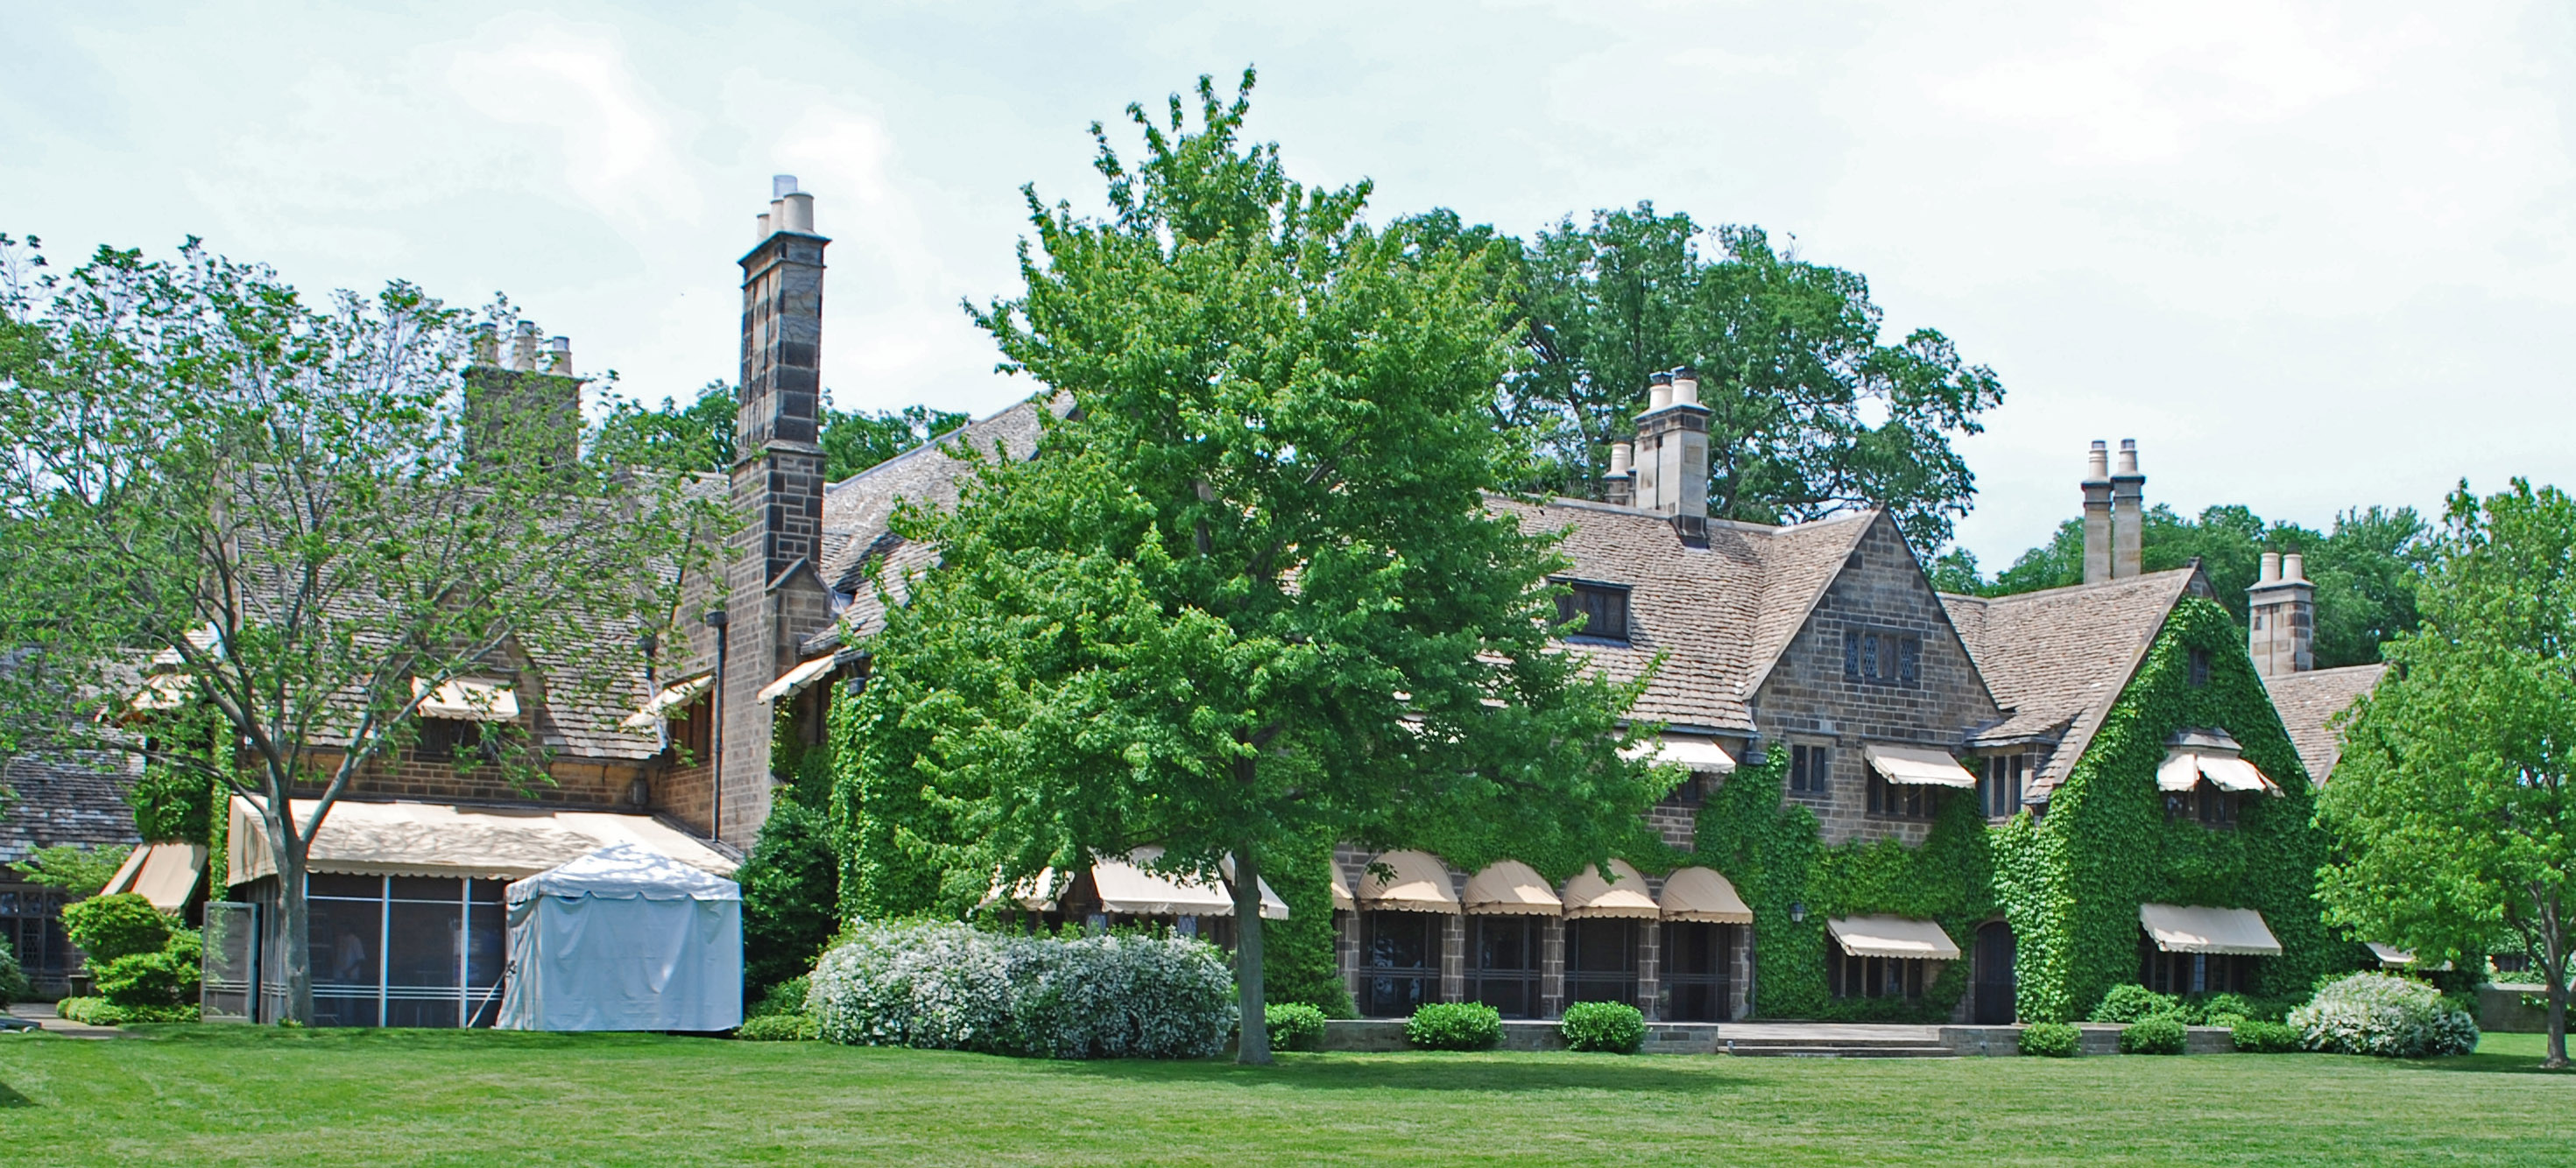 Benson Ford House